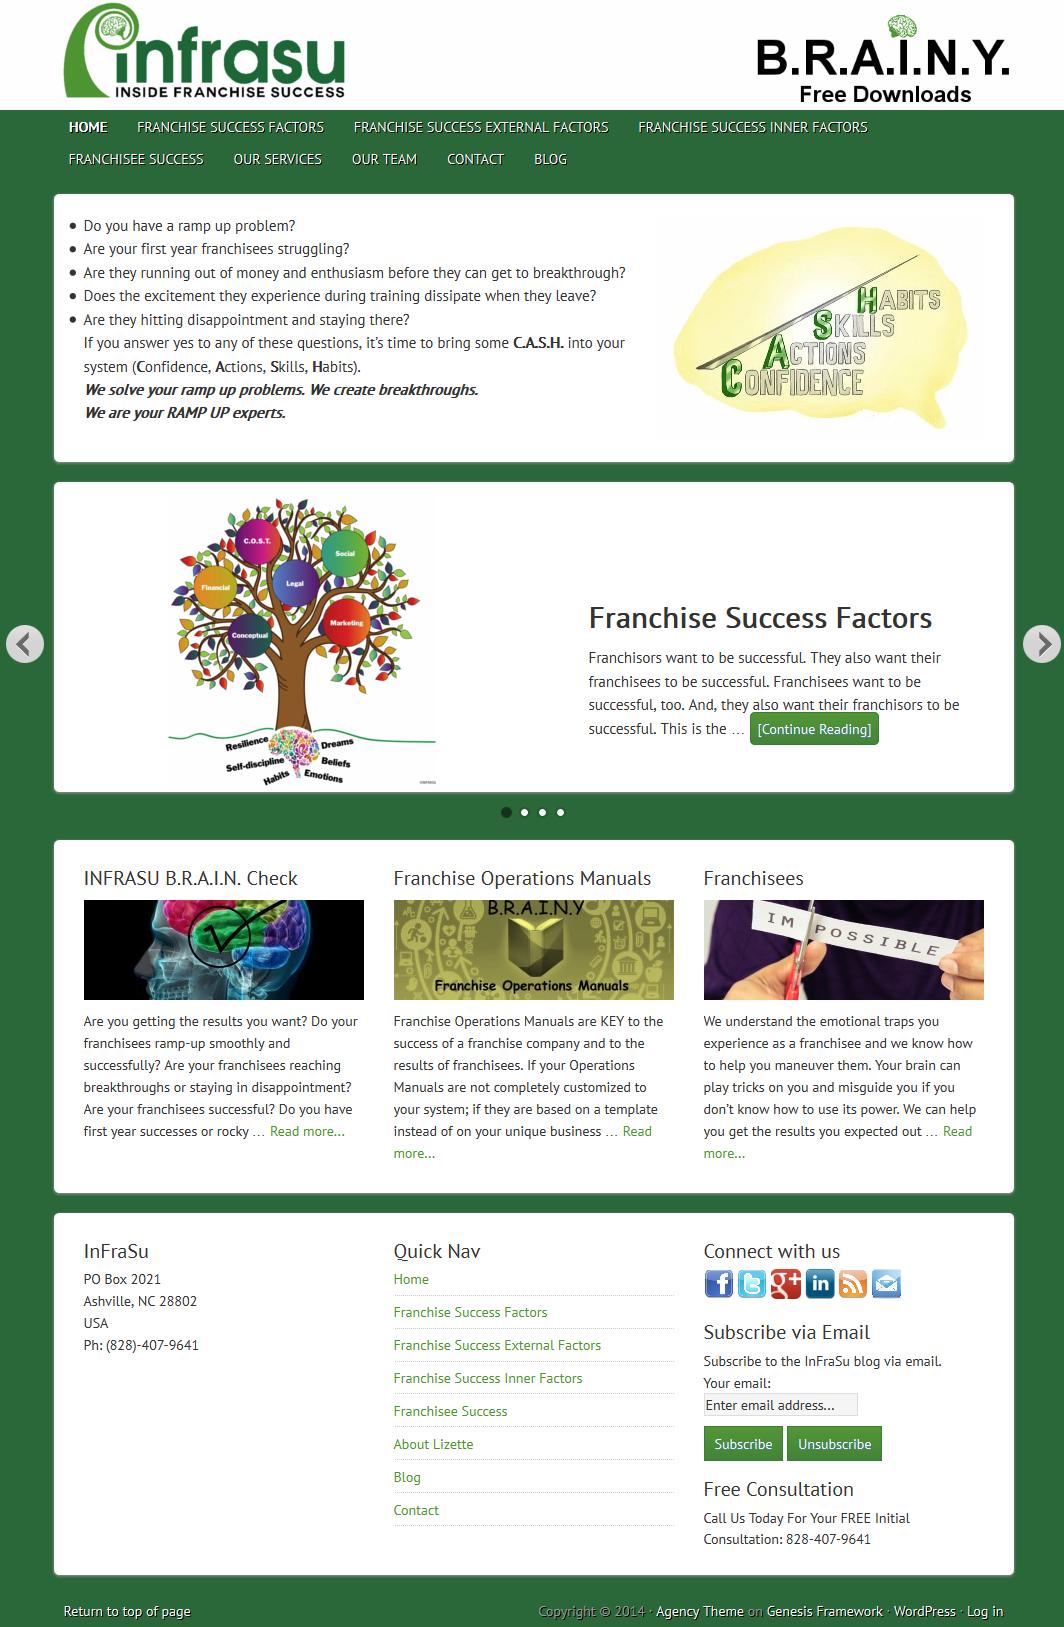 InFraSu - Inside Franchise Success website homepage.